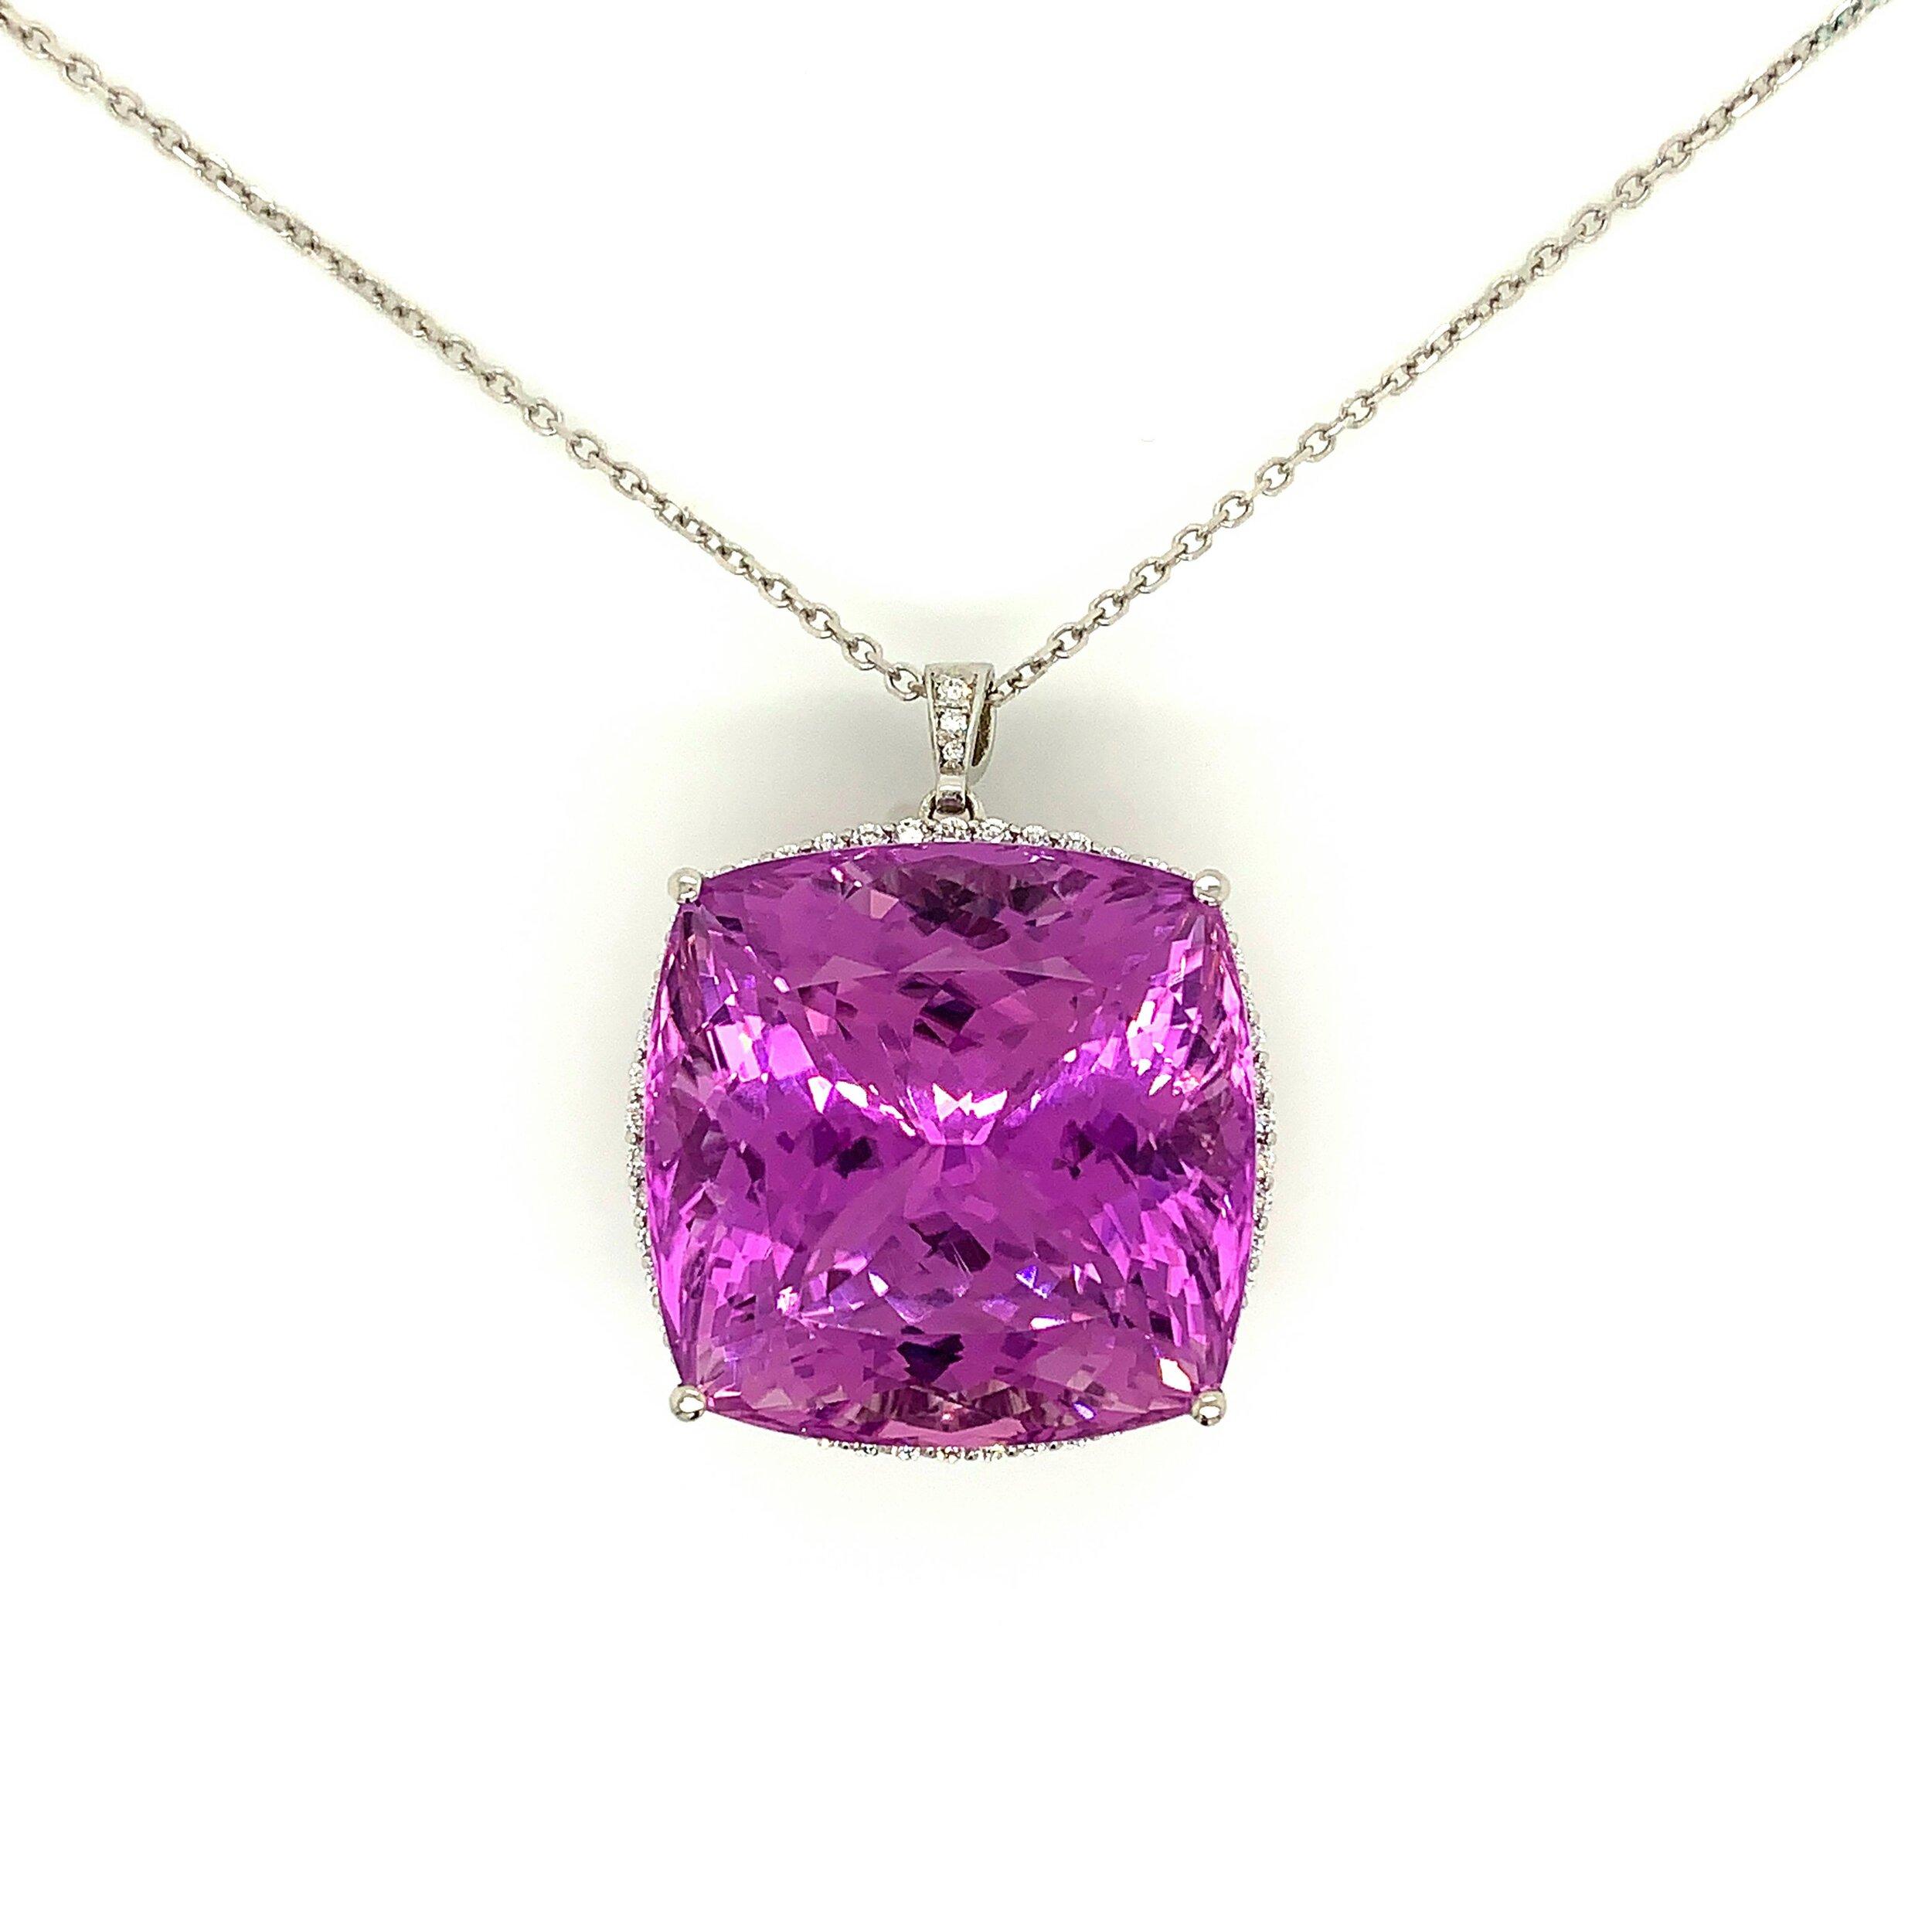 Kunzite Pendant Set with 1.09cts of Diamonds   Est. US$ 5,000-7,000